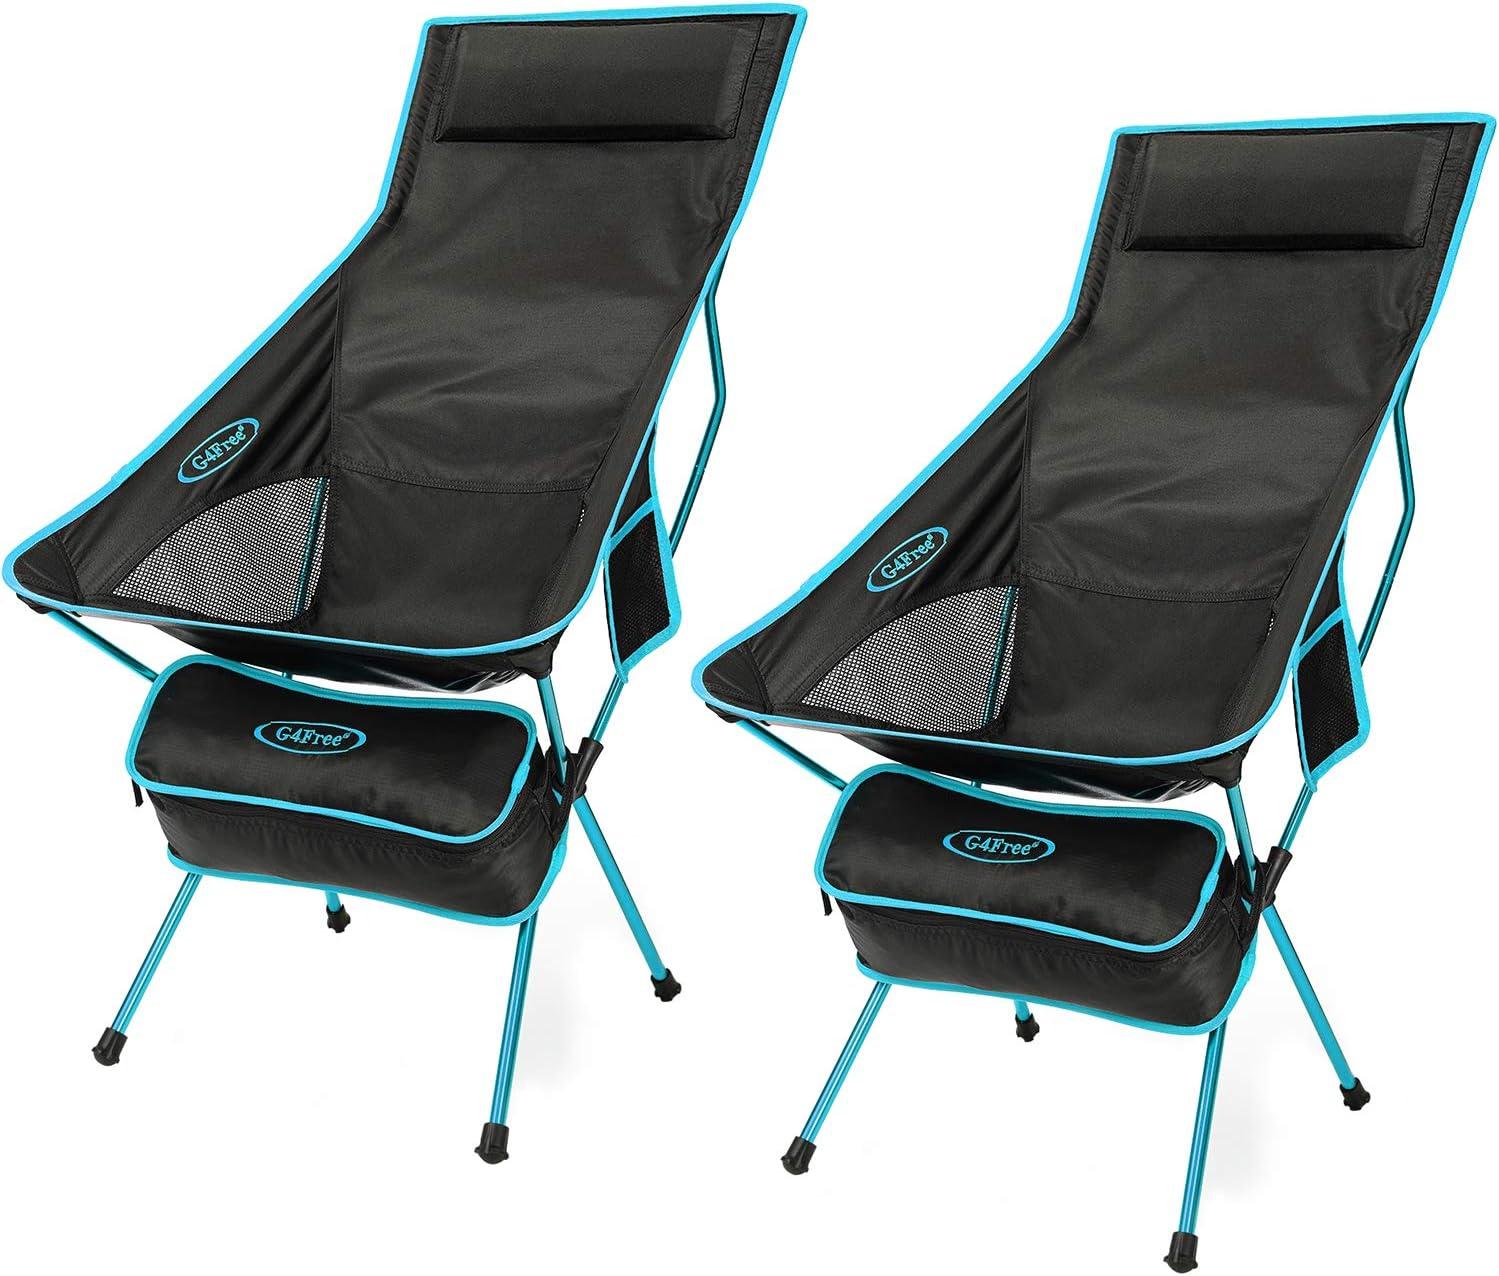 G4Free Silla de Camping Ligera Sillas de Salón de Campamento de Respaldo Alto Plegables al Aire Libre con Reposacabezas para Picnic Playa Senderismo ...